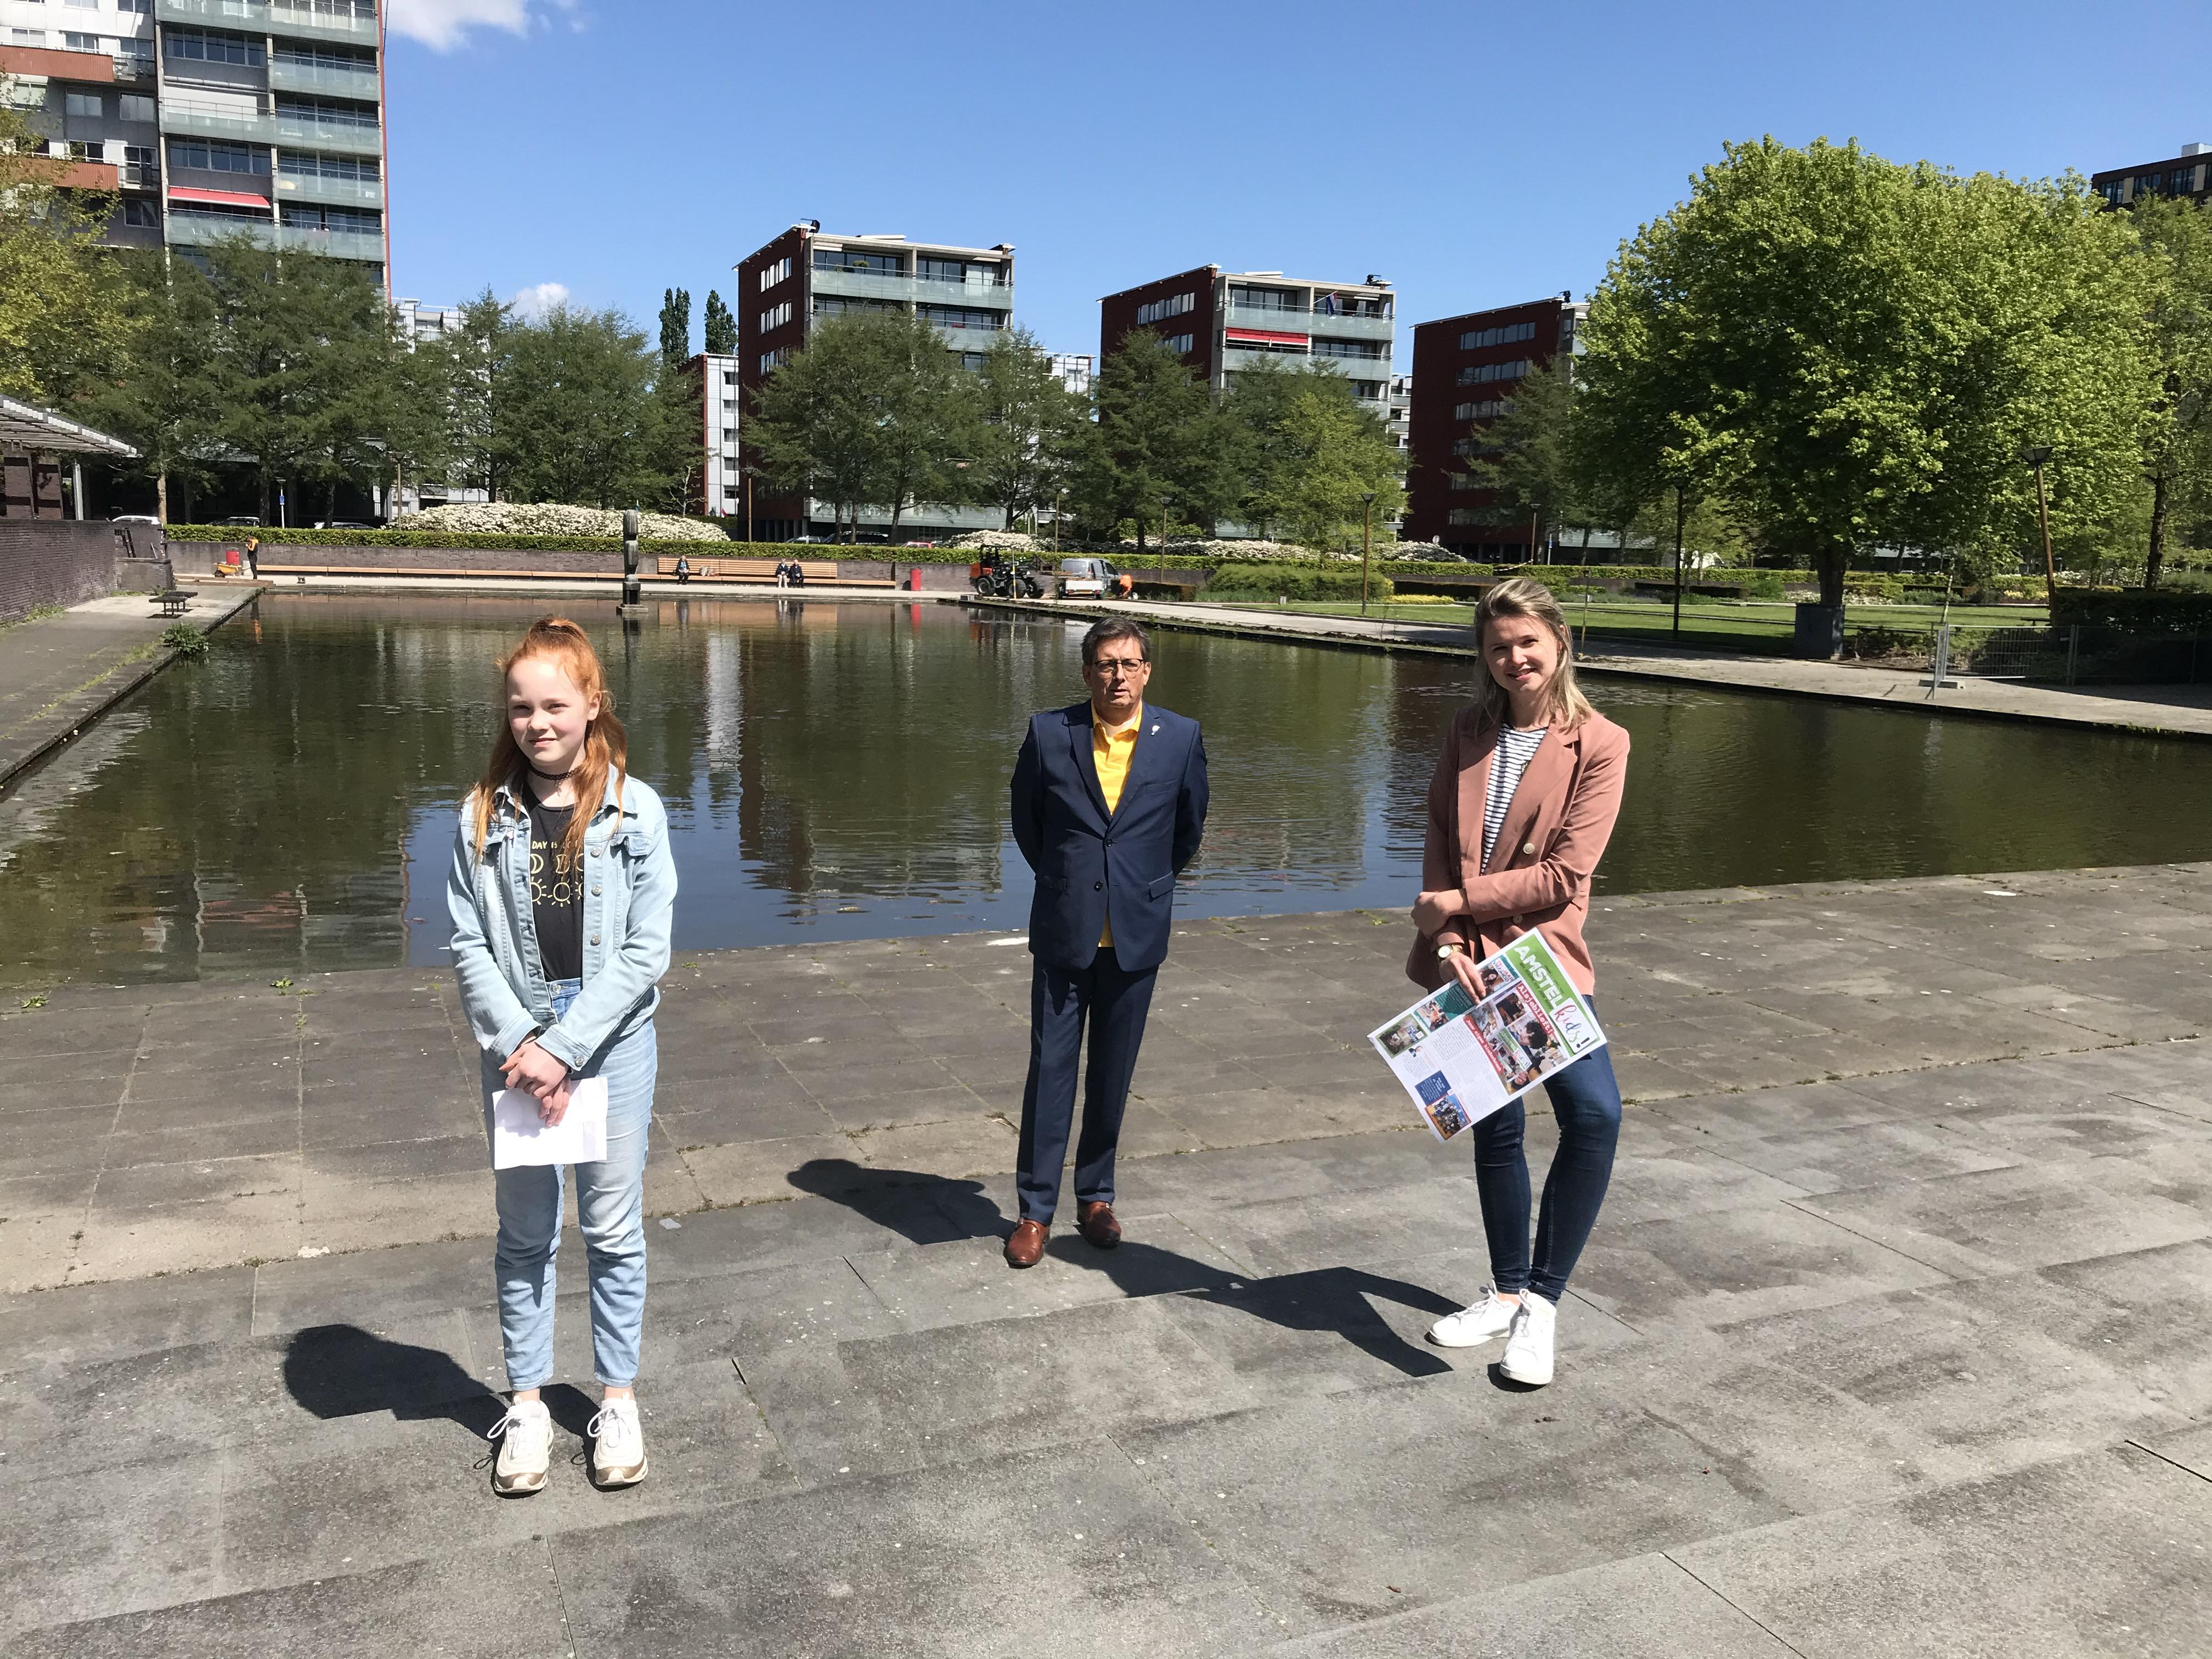 gedichtenwedstrijd_2020_amstelveen_oranje.jpg